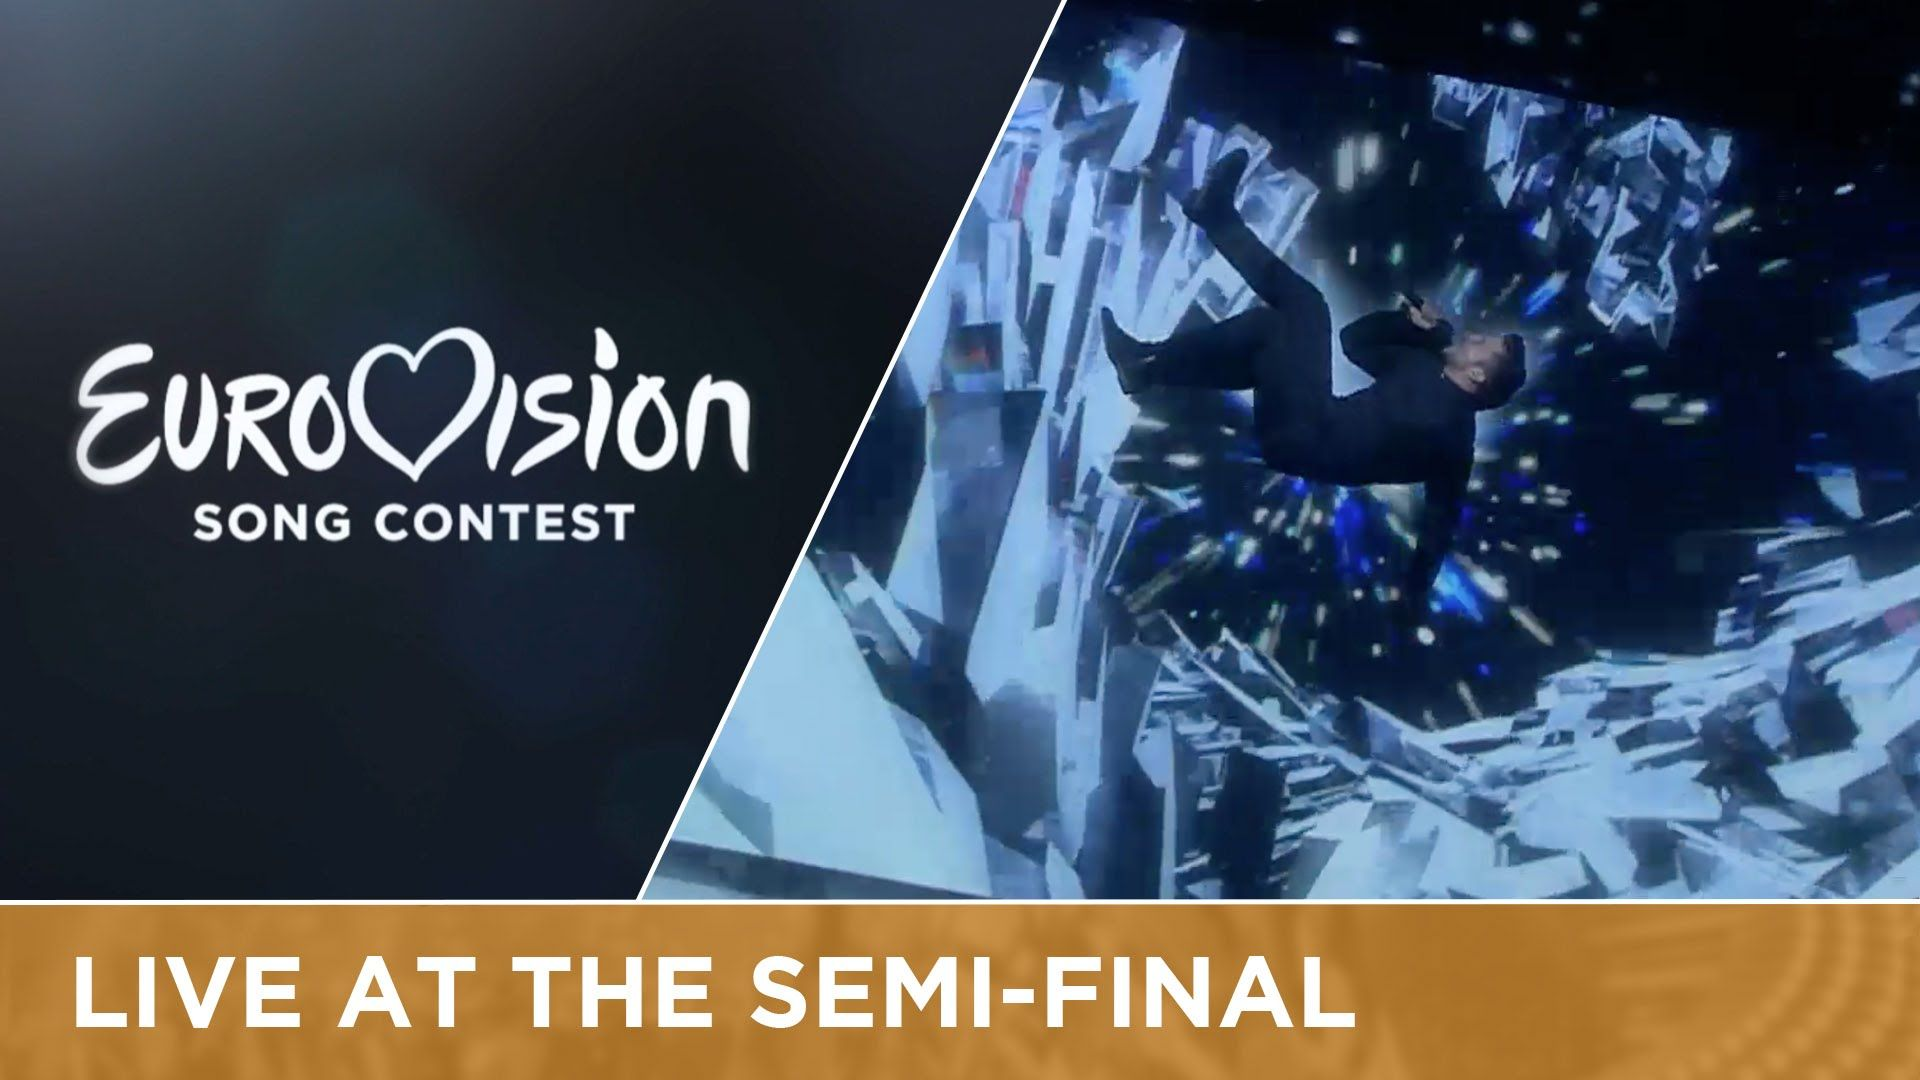 Sergey Lazarev represents Russia at the 2016 Eurovision